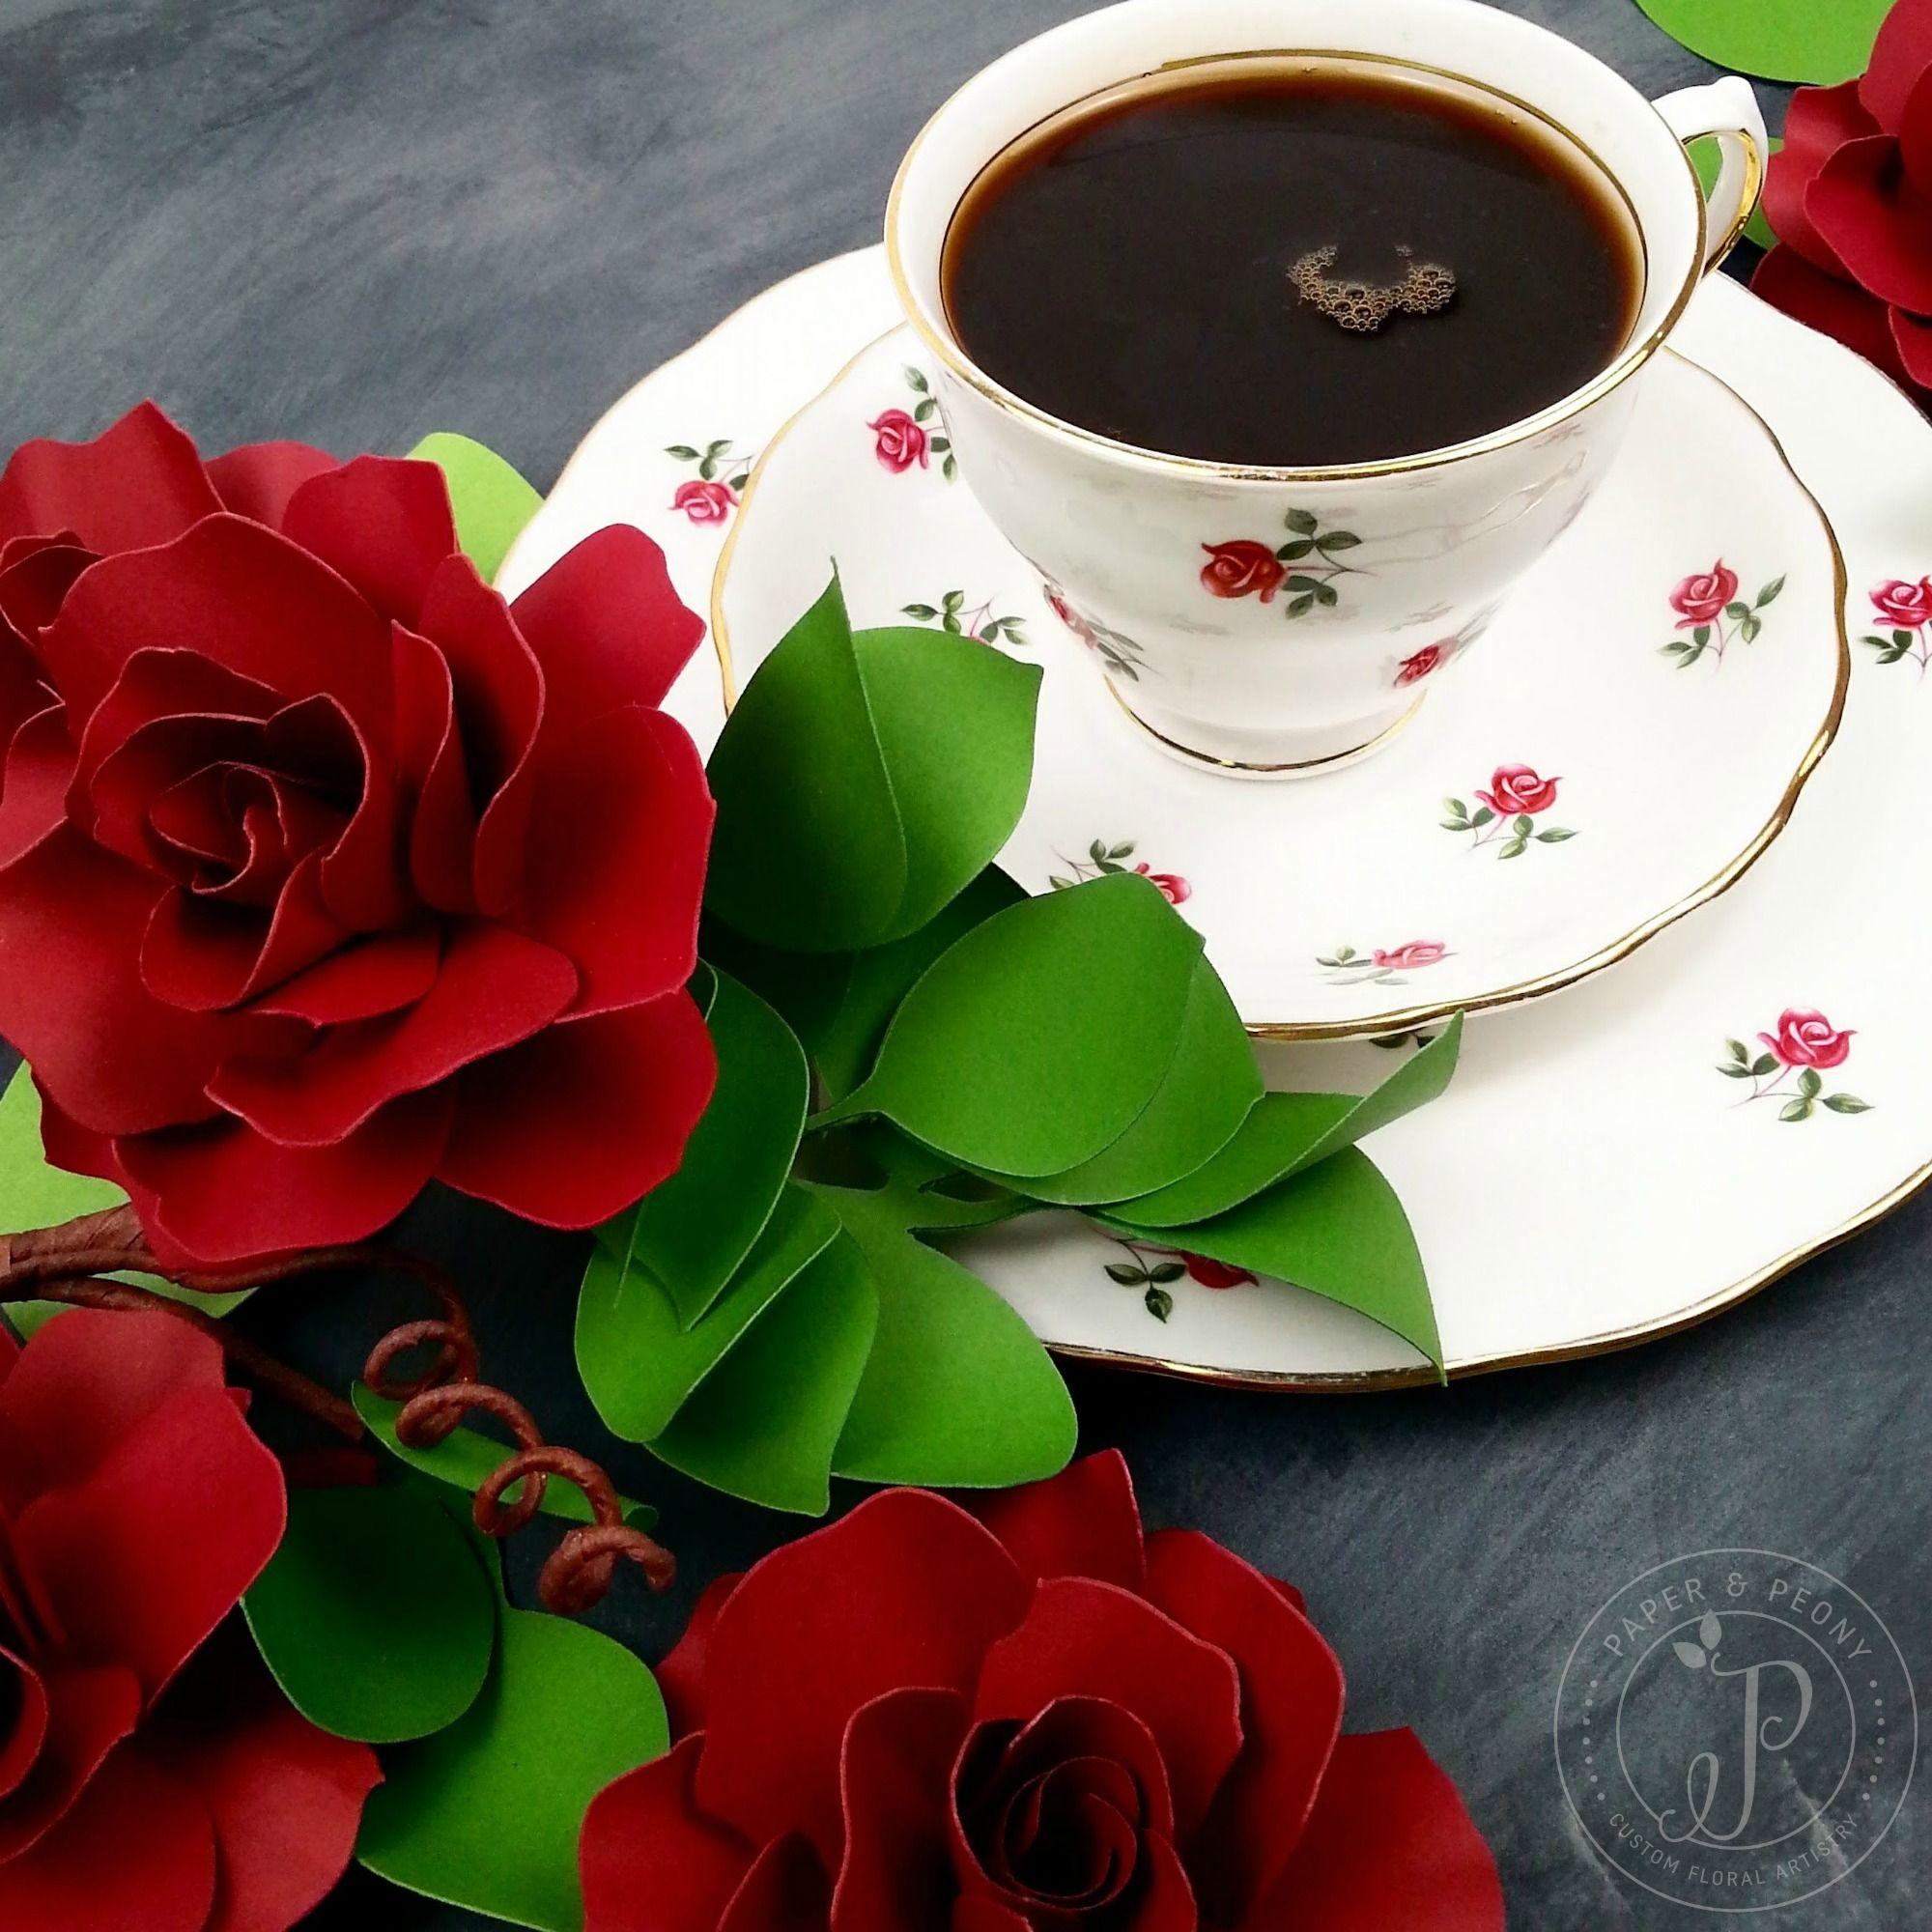 Paper Peonies Happy Friday Teacup Tea Cup